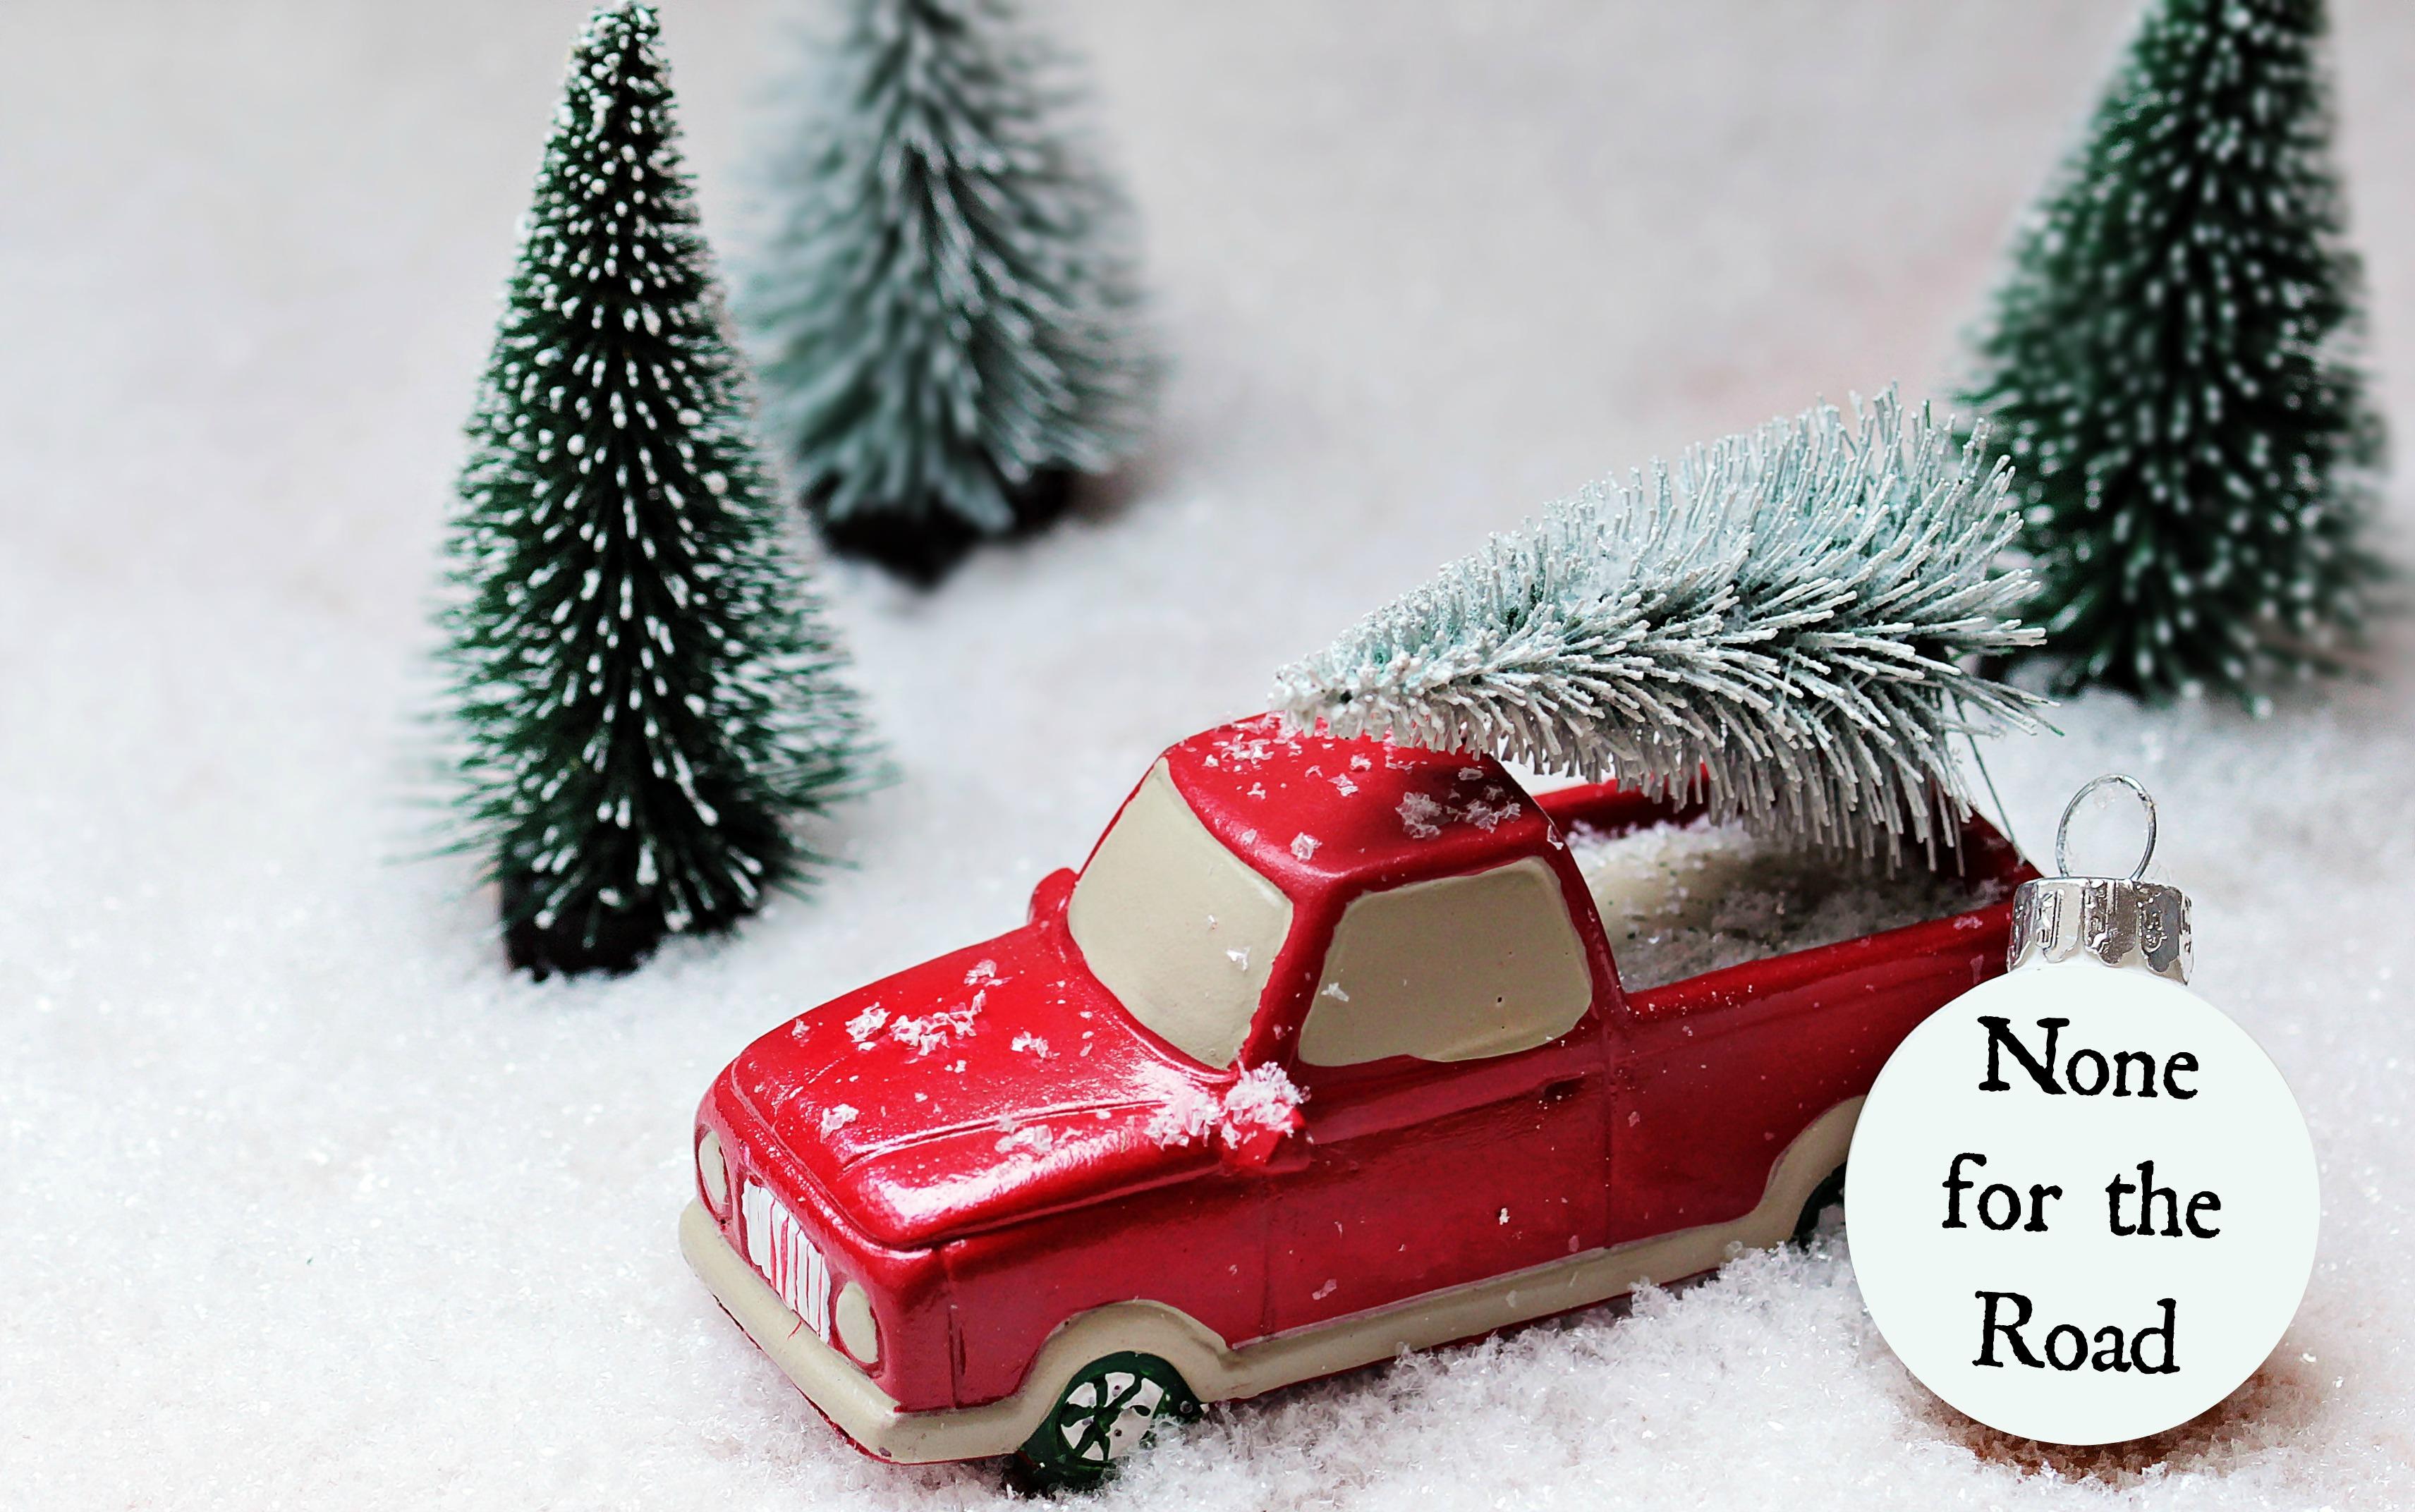 Christmas Crackdown: 149 Arrested During Drink & Drug Drive Campaign